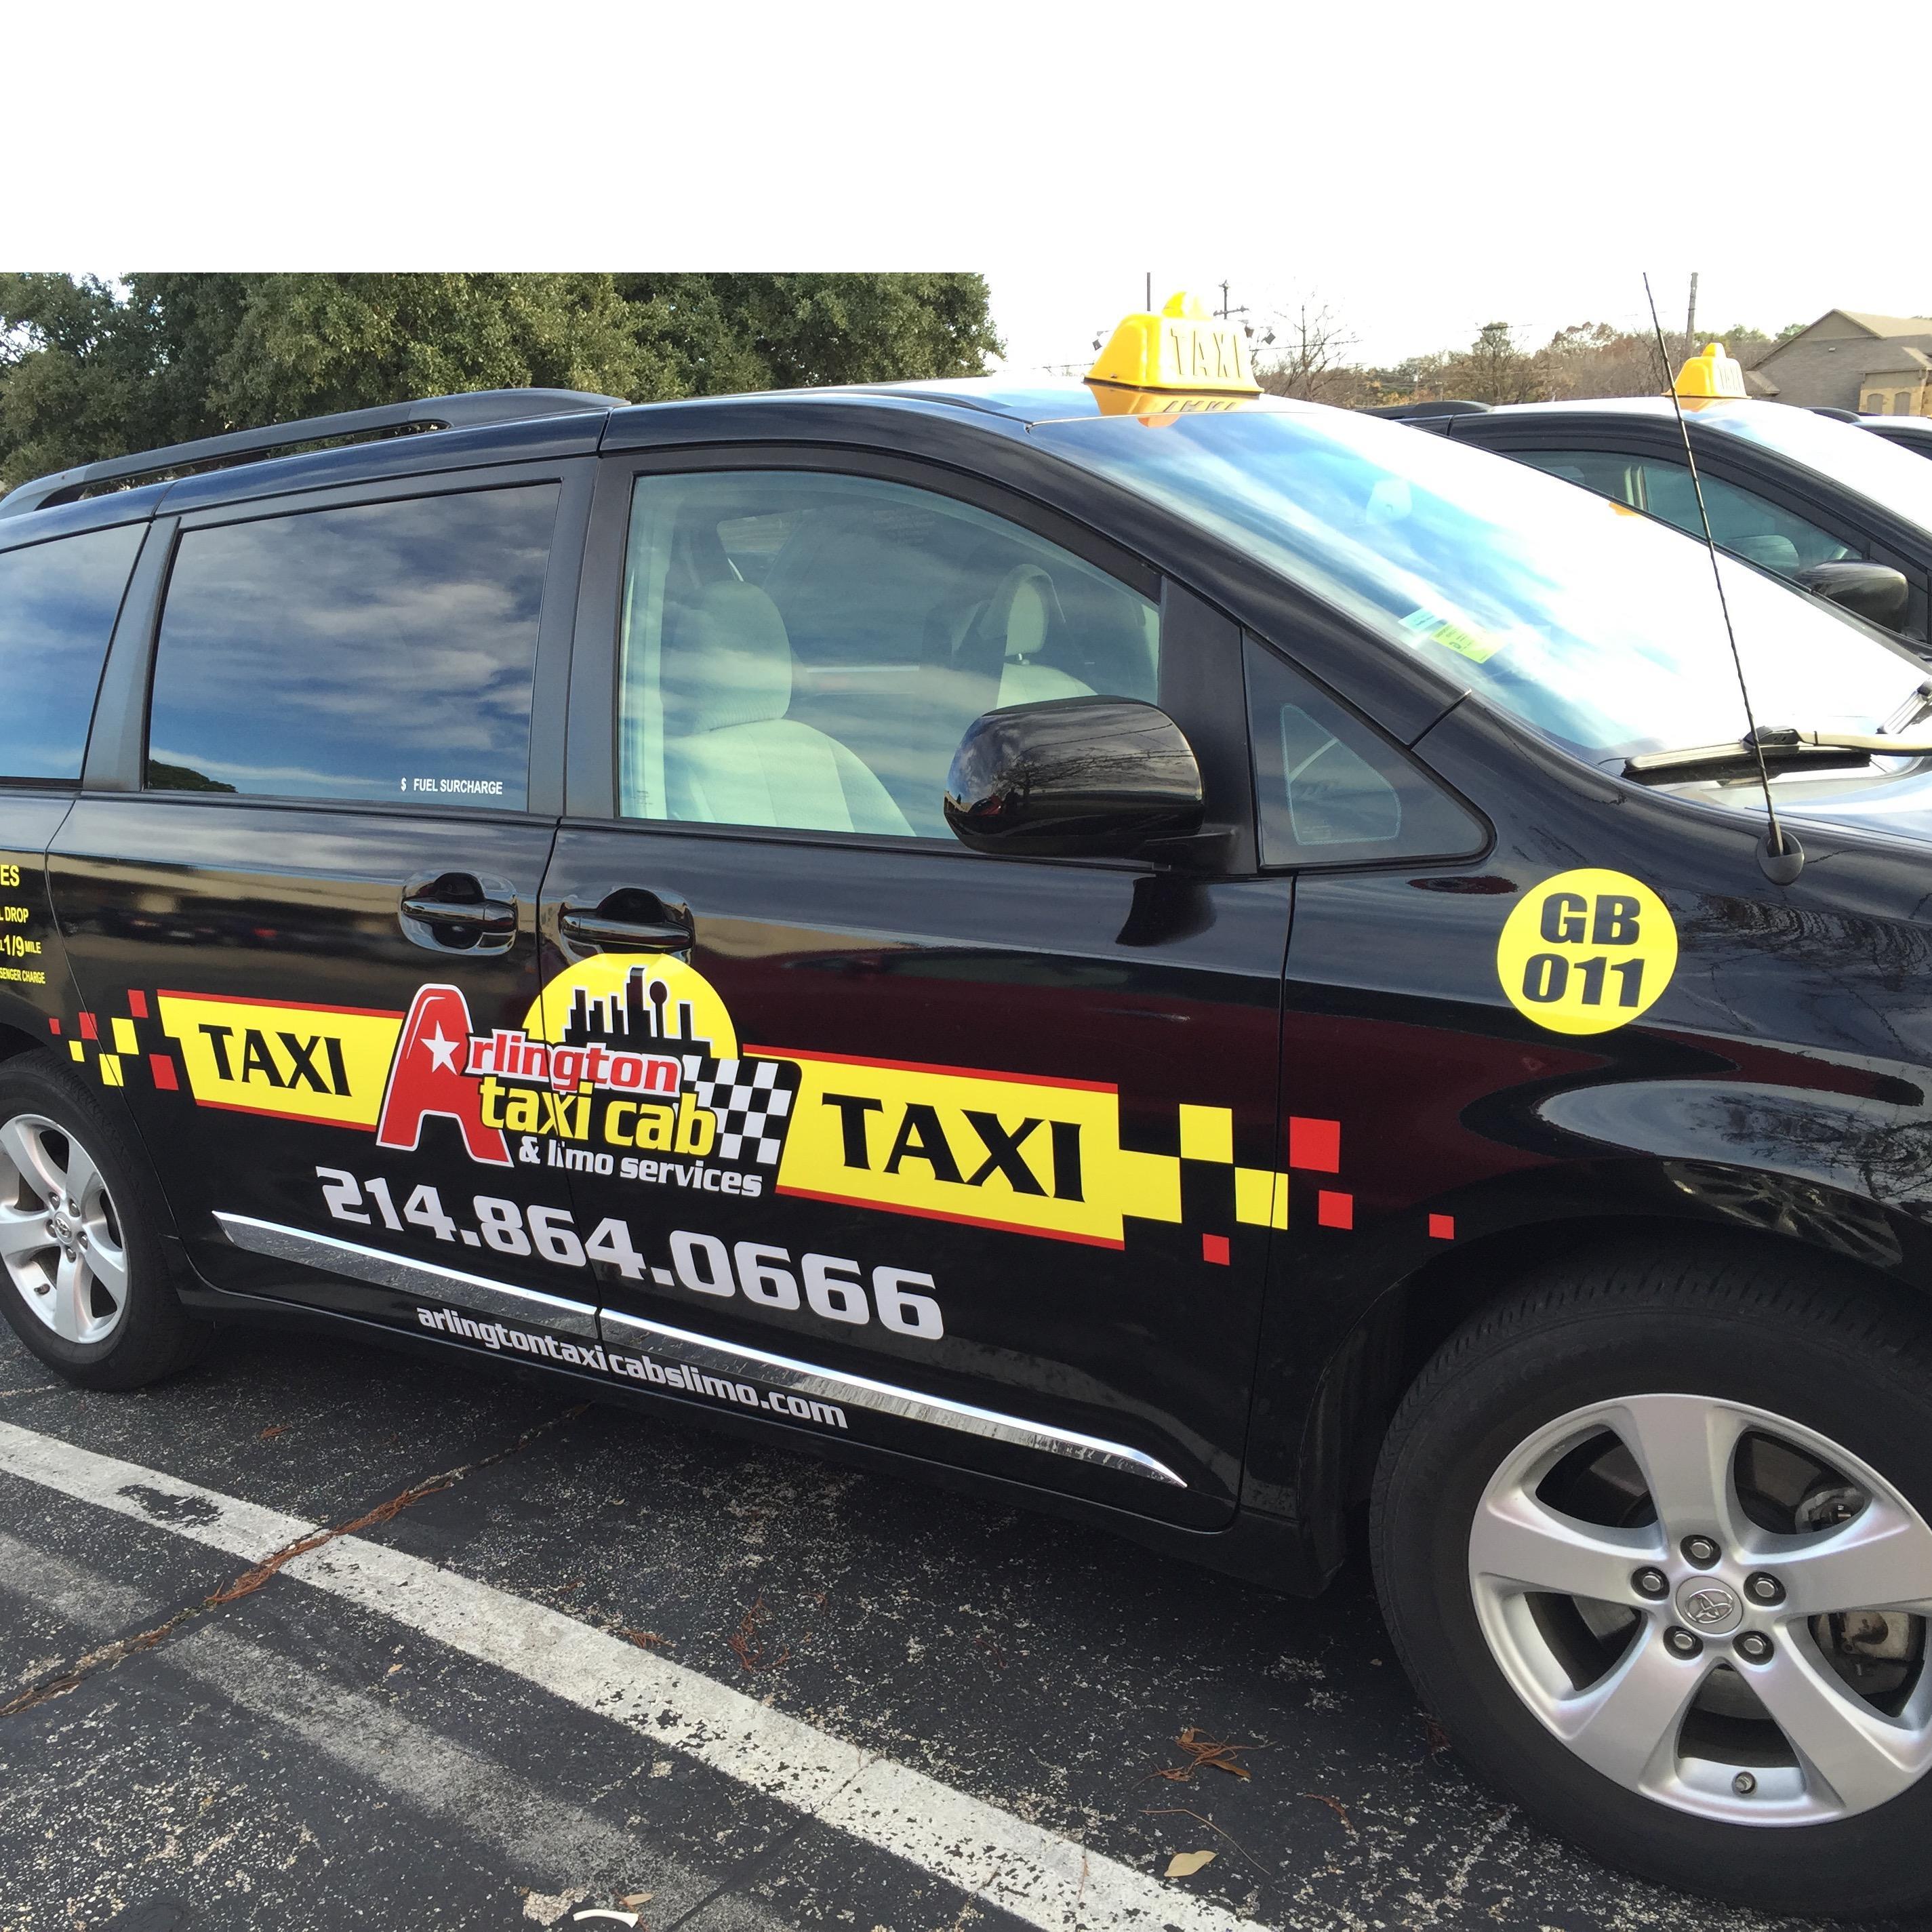 Arlington Taxi Cab & Limo Services